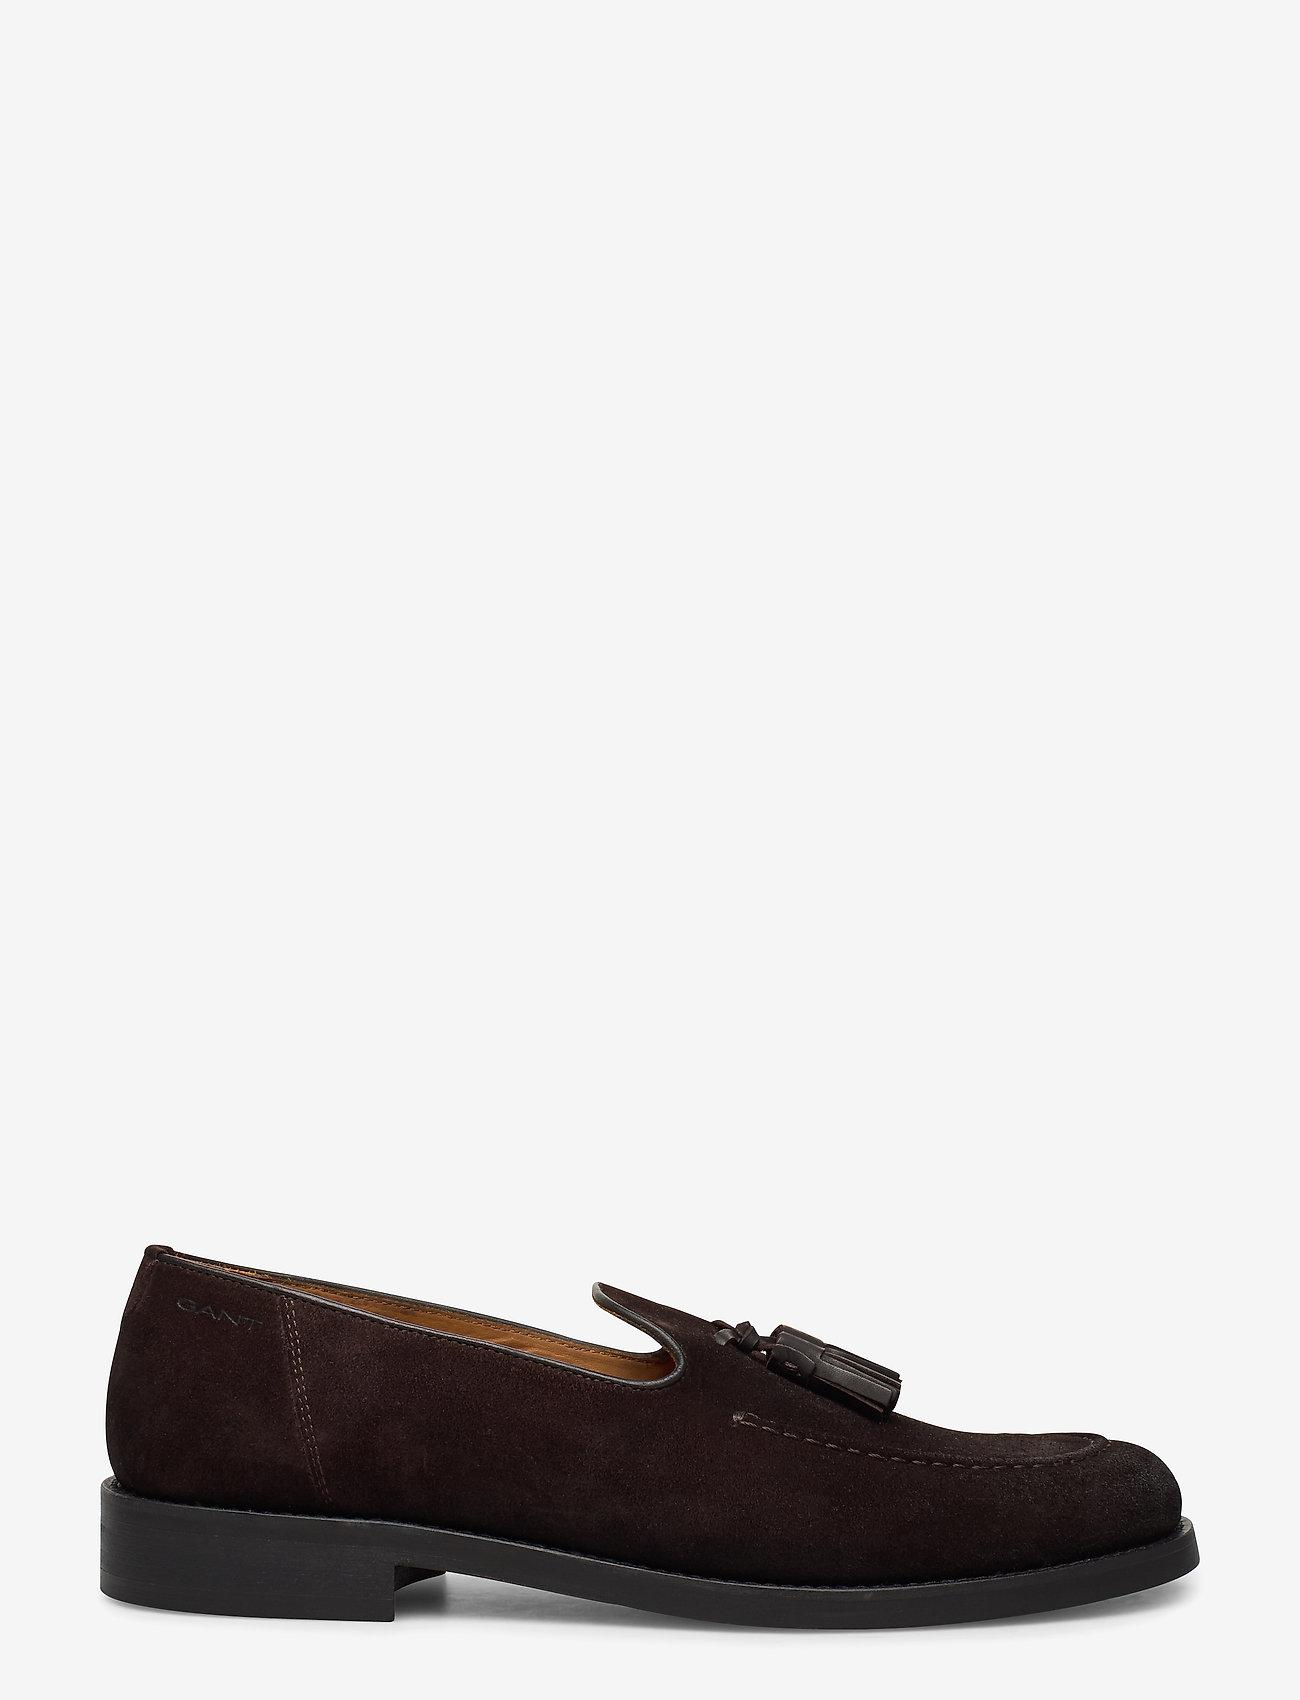 GANT - Almon Slip-on shoes - instappers - dark brown - 1